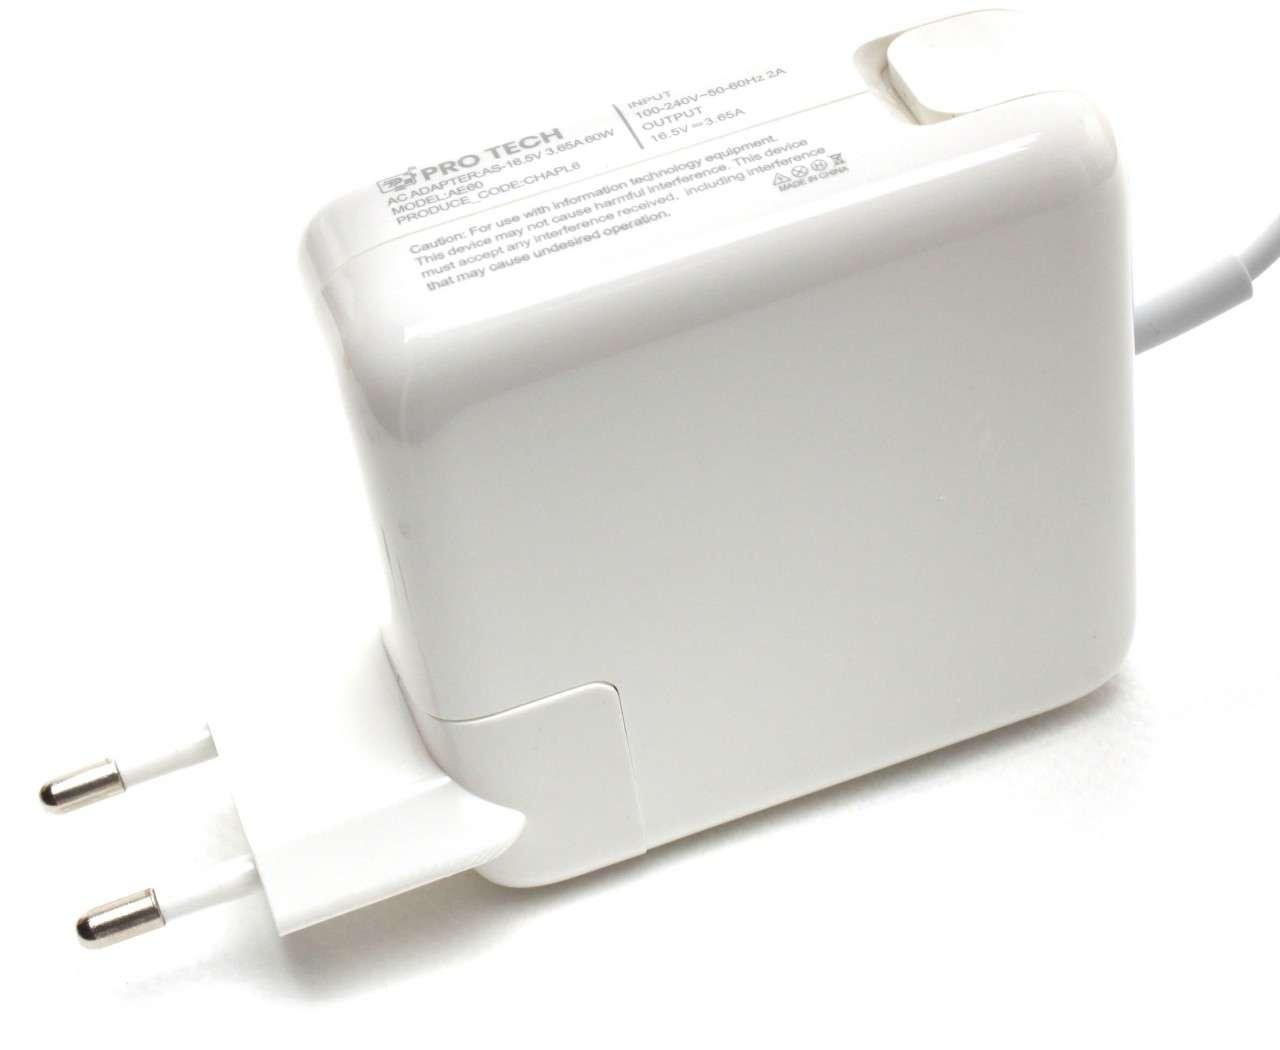 Incarcator Apple MacBook 13.3 inch MA472LLA Replacement imagine powerlaptop.ro 2021